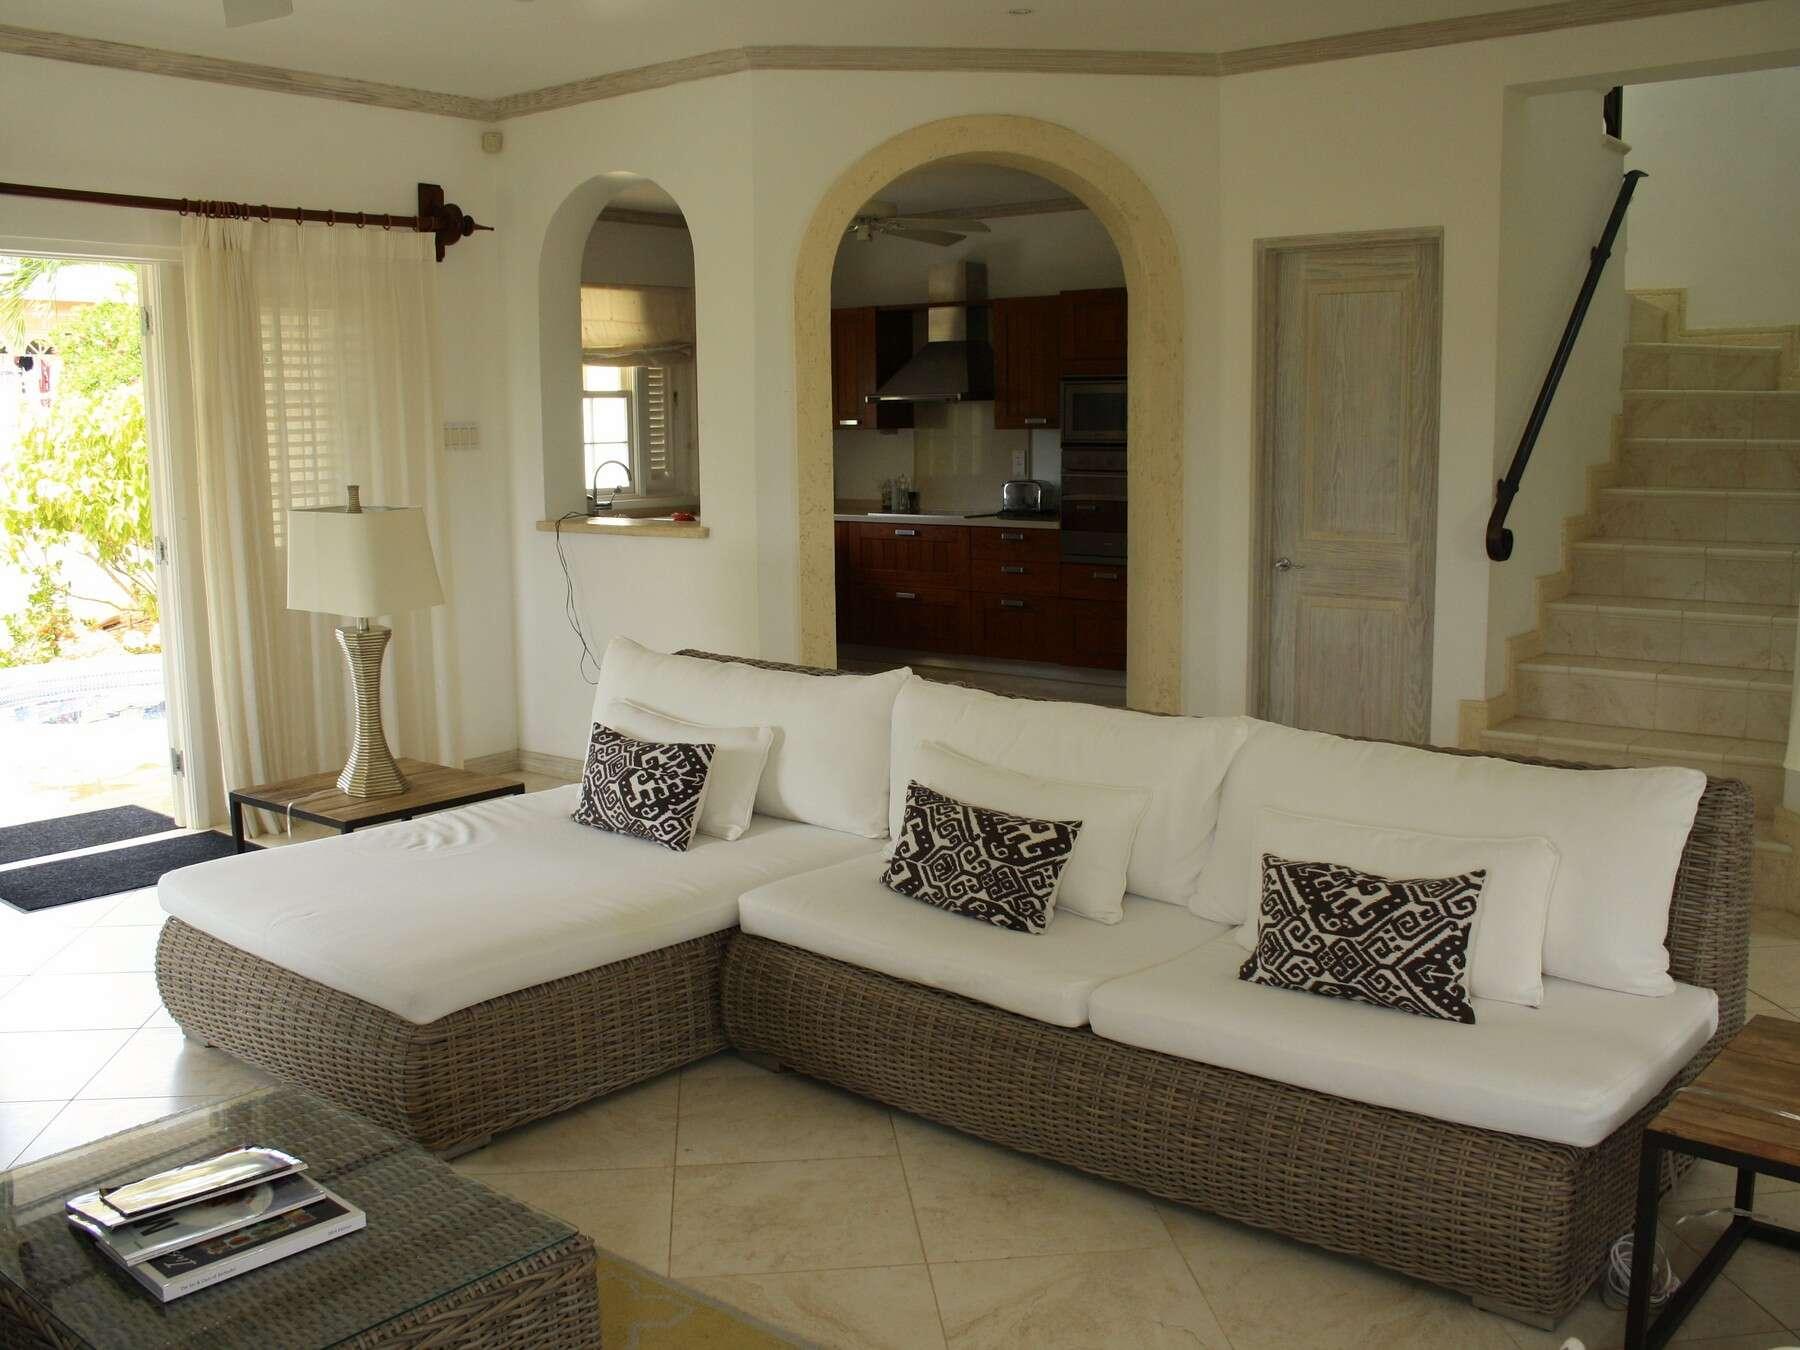 Luxury villa rentals caribbean - Barbados - St peter - Mullins - Battaleys Mews 1 - Image 1/11